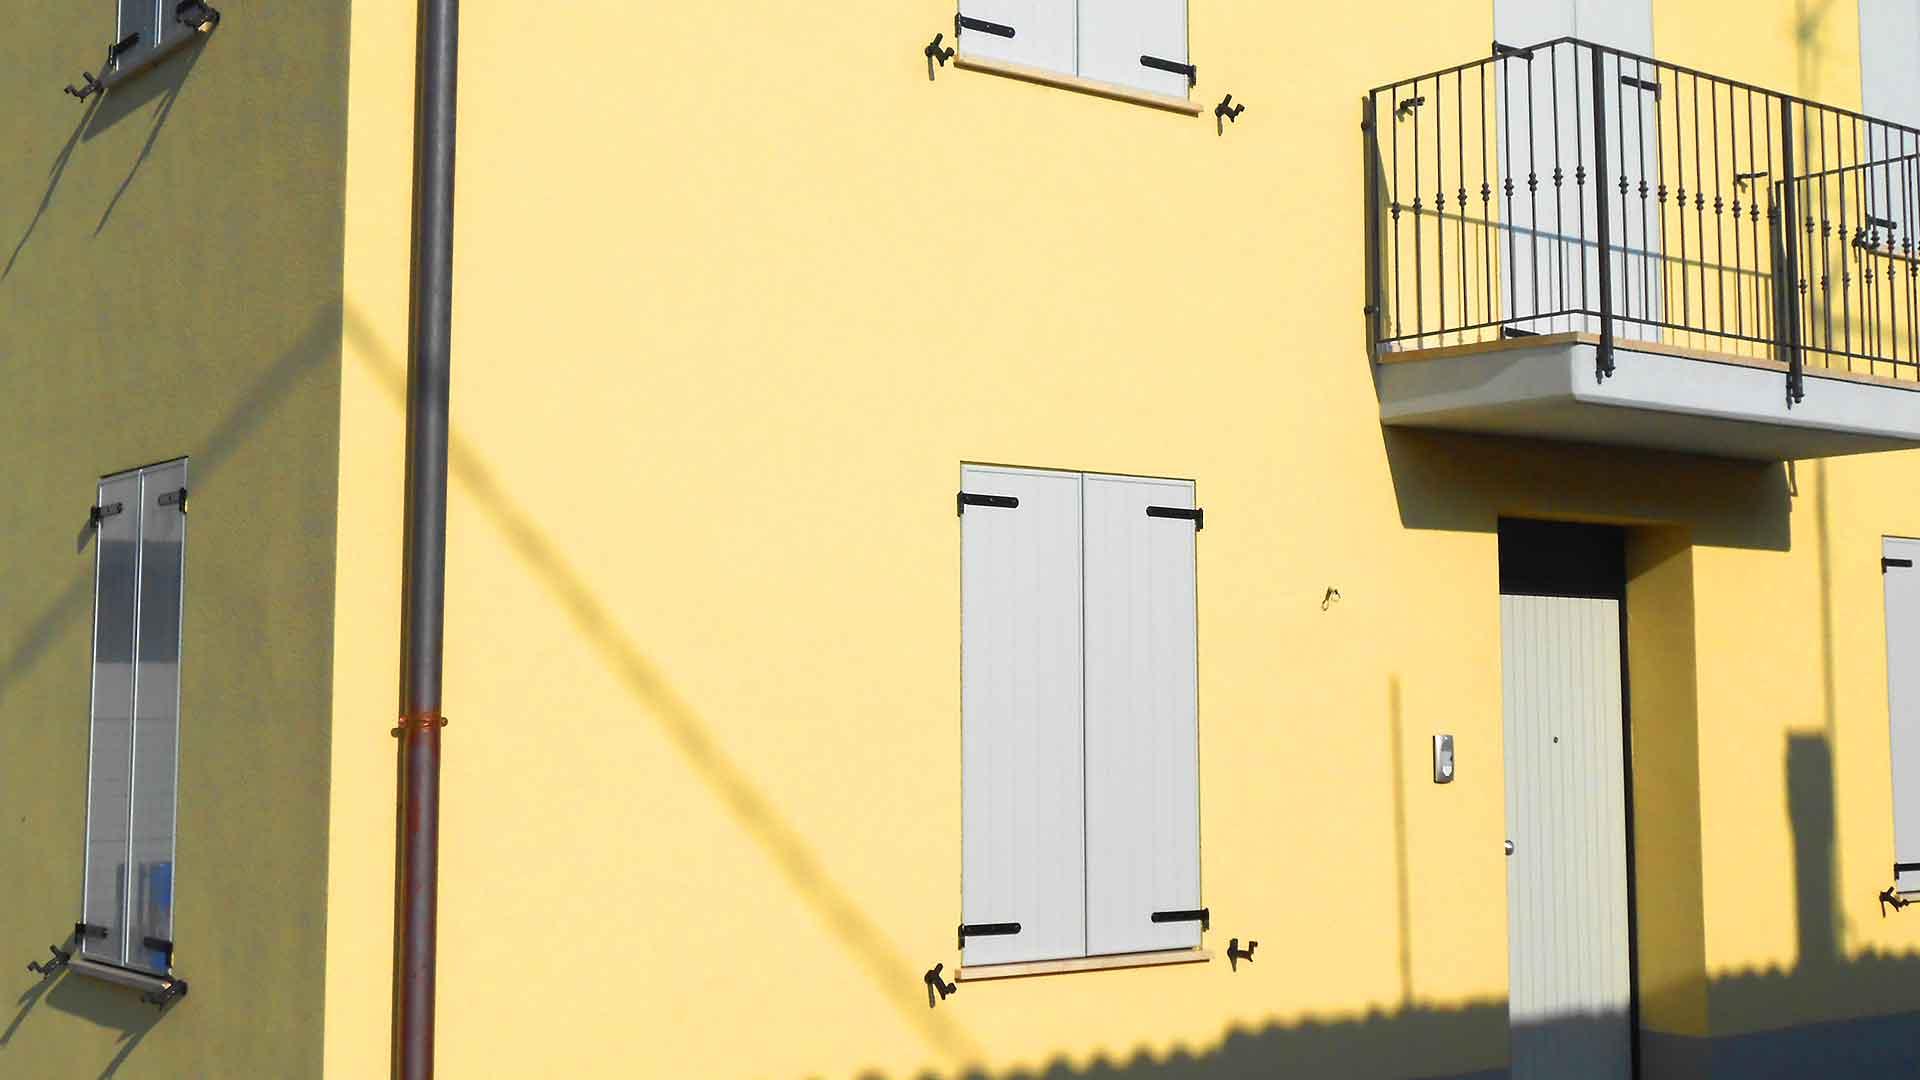 Alcoplan finestre modena infissi e serramenti a modena e - Porte e finestre modena ...